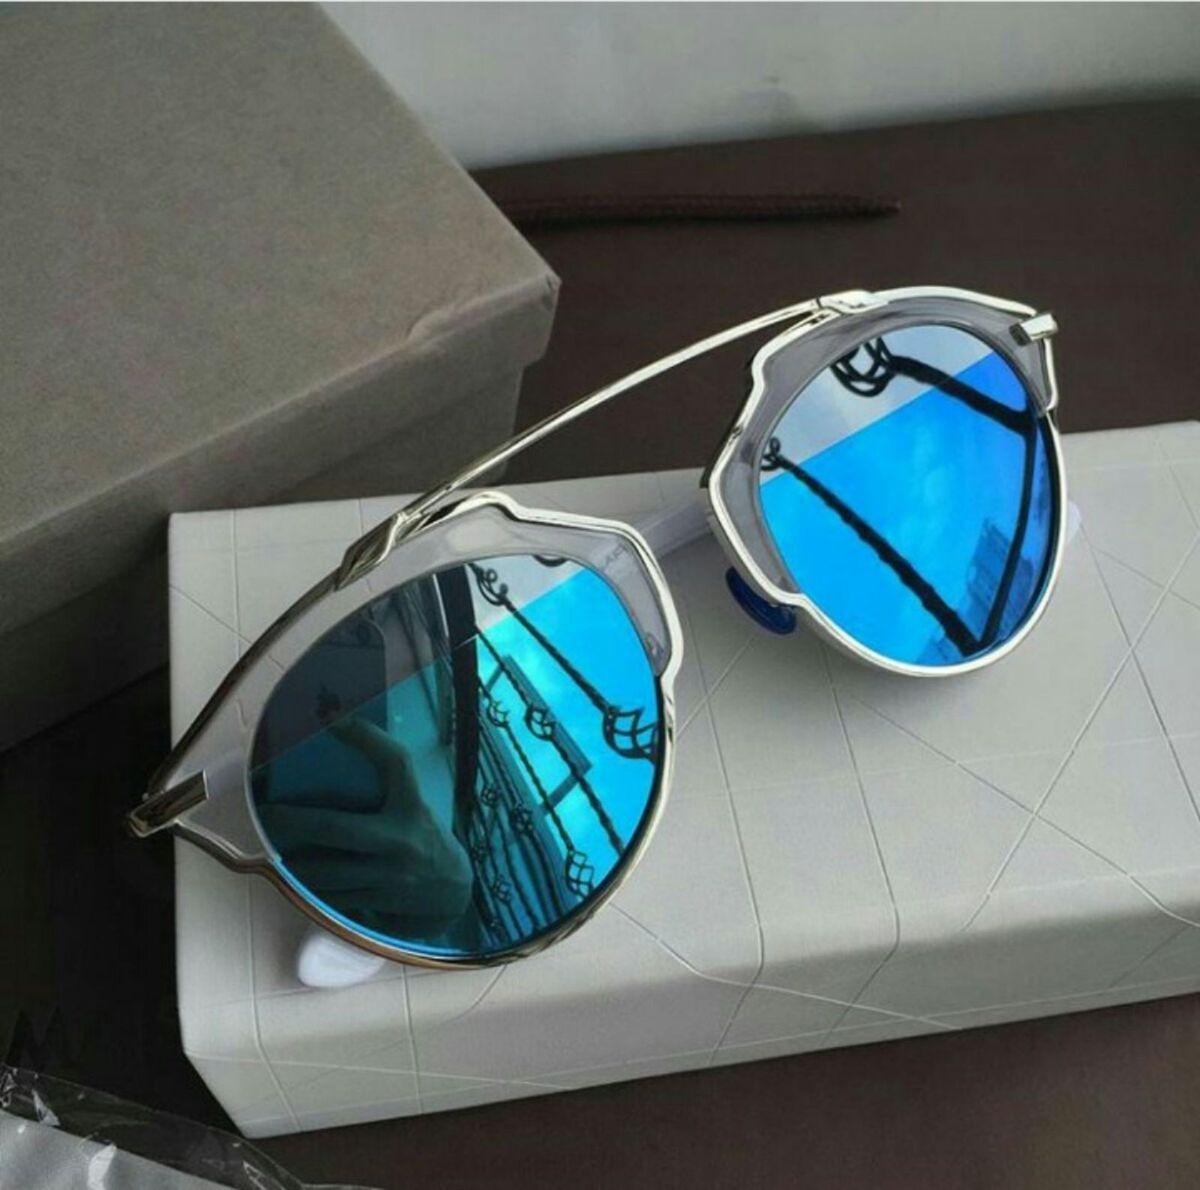 oculos dior so real azul - óculos dior.  Czm6ly9wag90b3muzw5qb2vplmnvbs5ici9wcm9kdwn0cy80mzg3njavztvhmwuzngy0ntqyyzzmyjziote3oddlmjhjmti4yjguanbn  ... 9150d90d2c